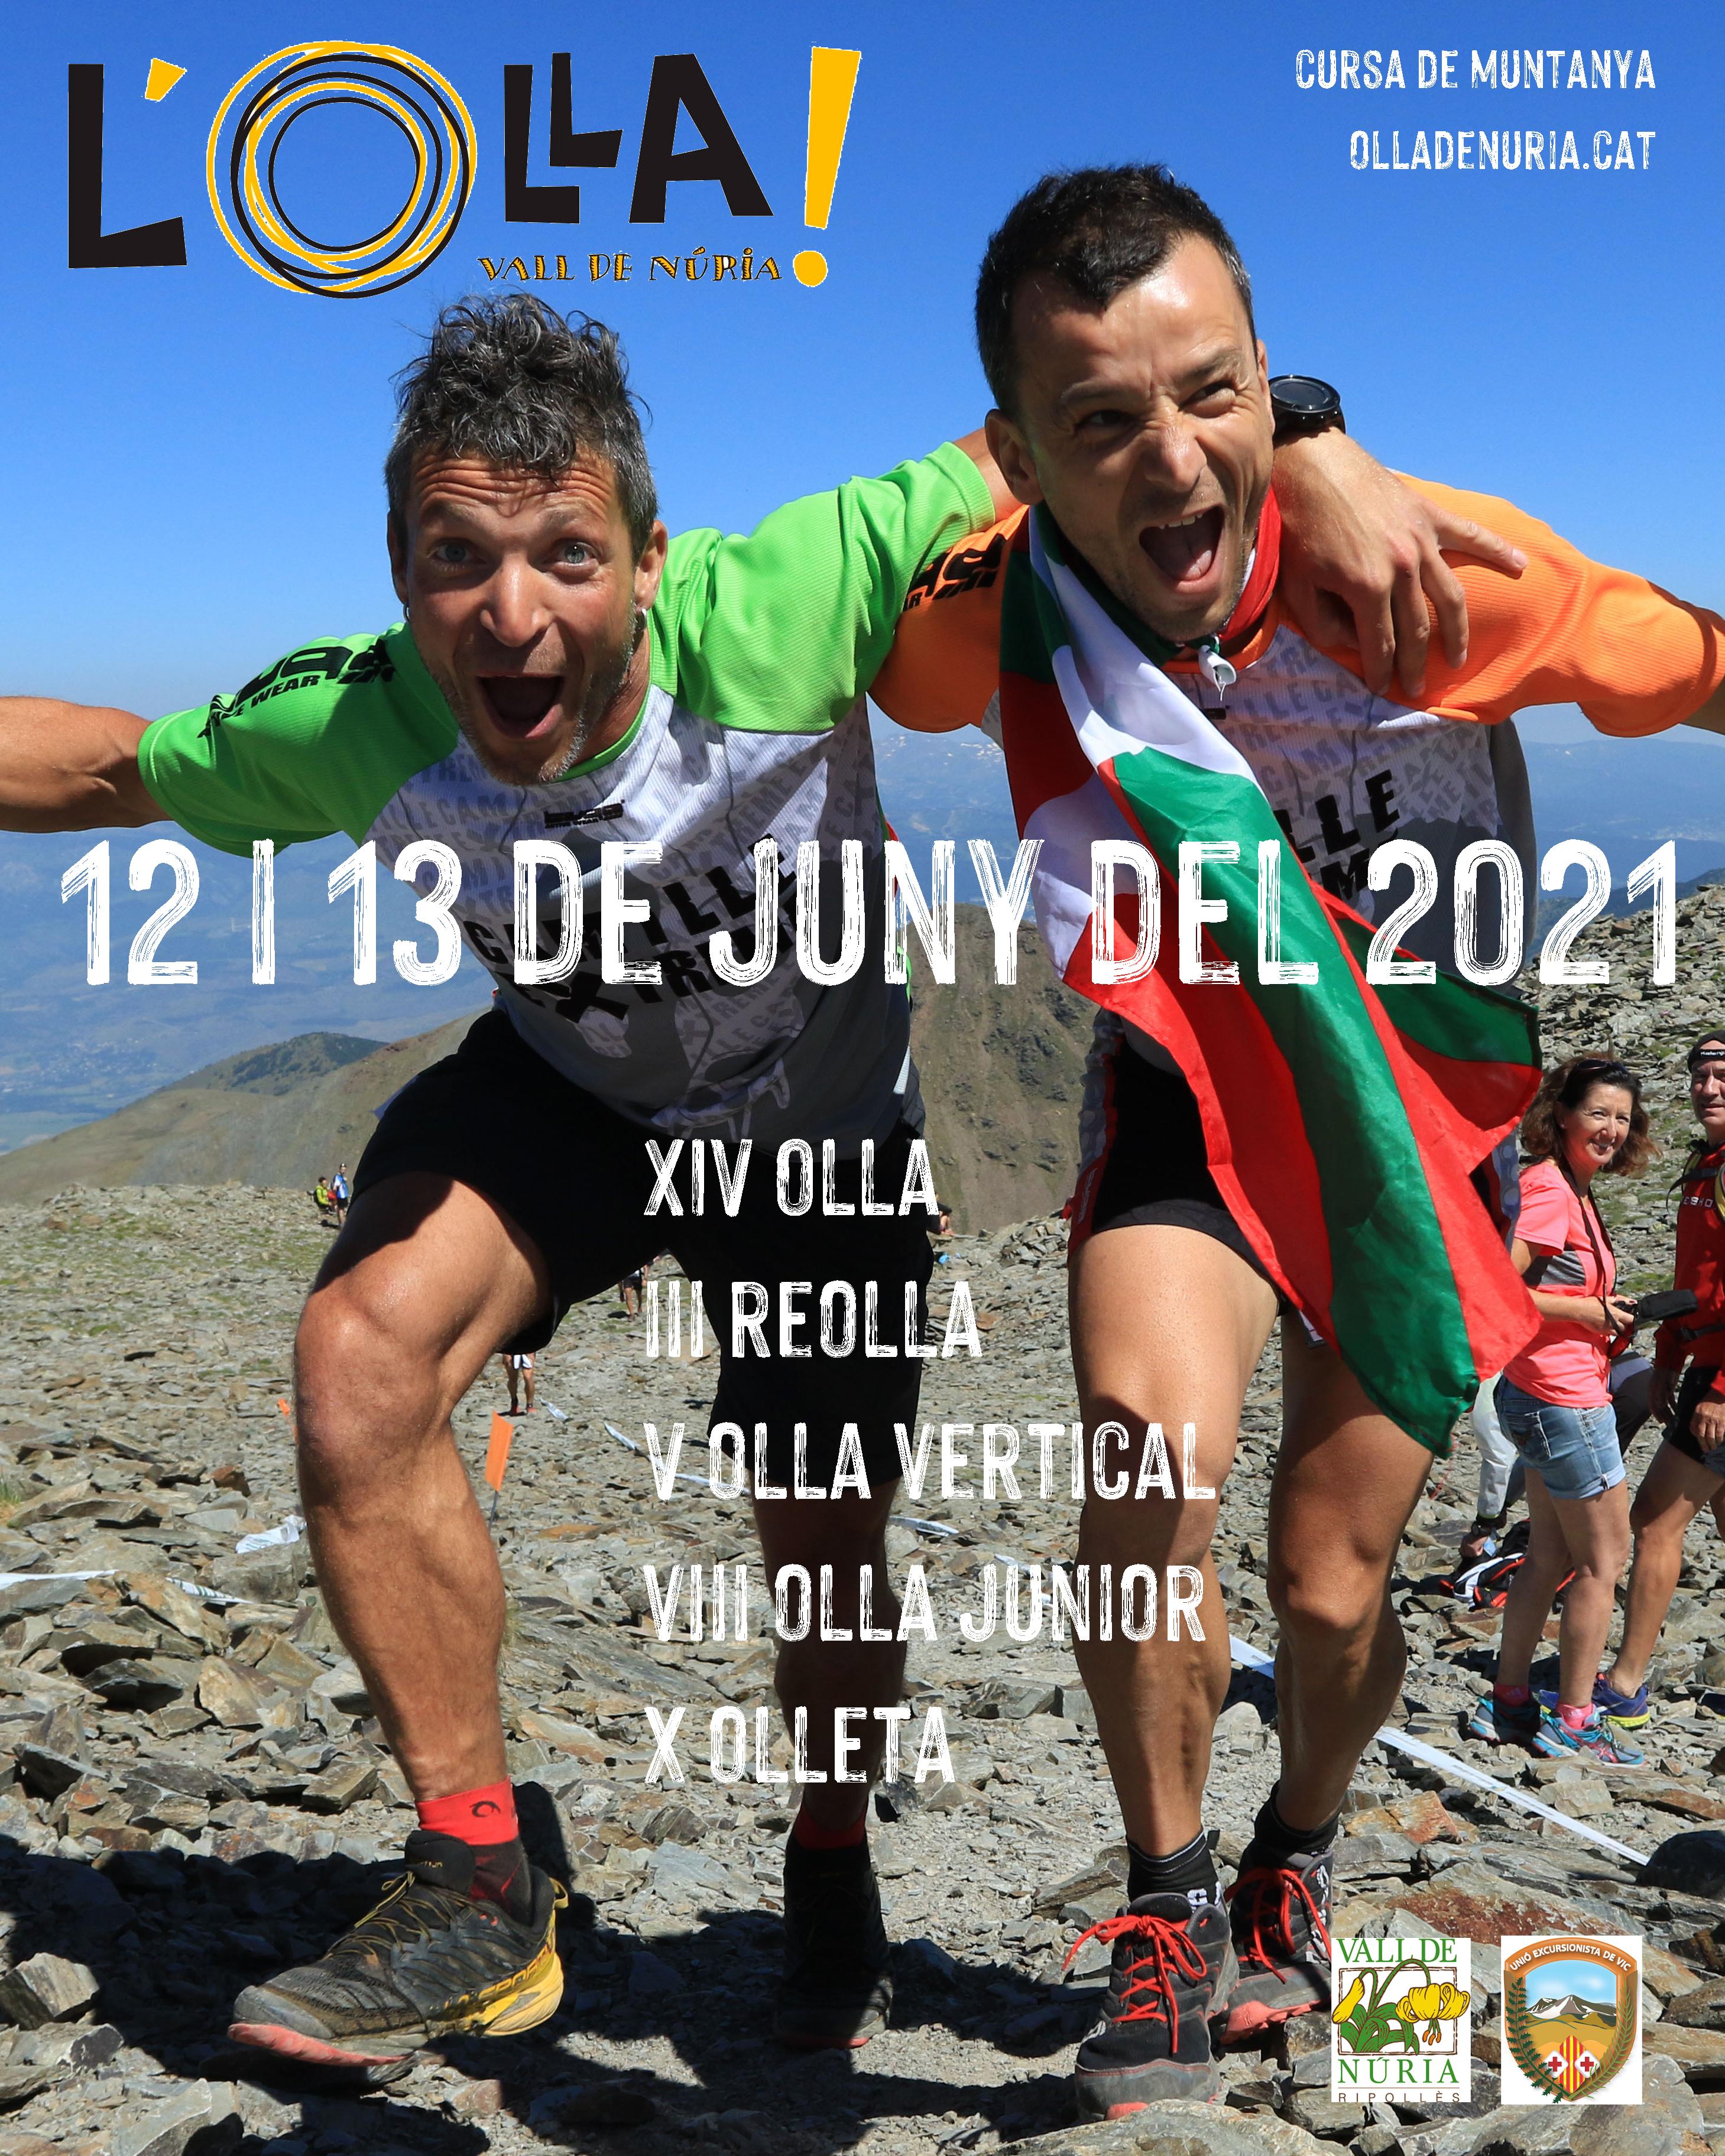 Tenim data de l'Olla de Núria 2021! – Unio excursionista de Vic